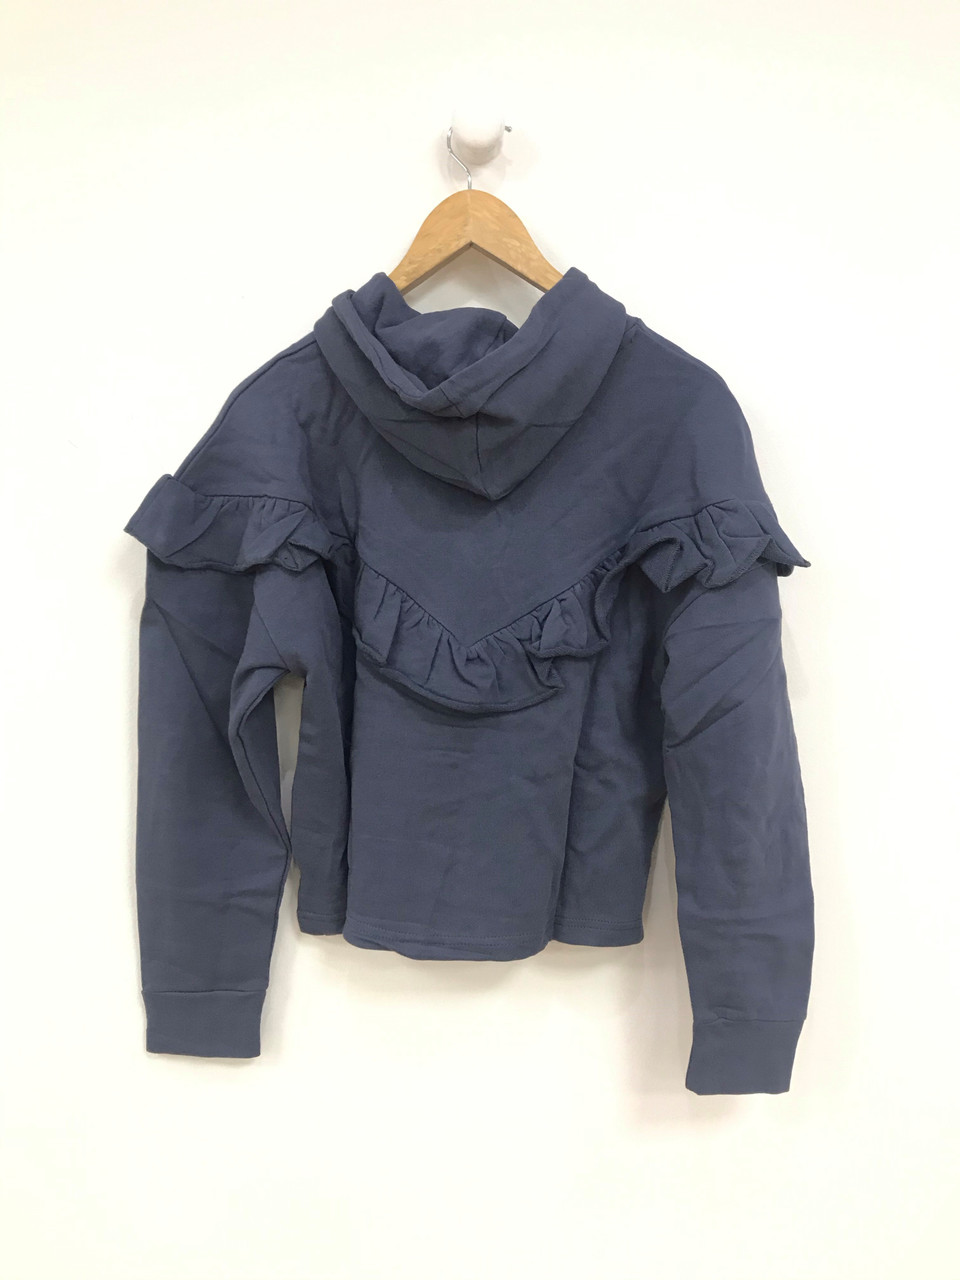 Blue Hooded Ruffle Sweat Top